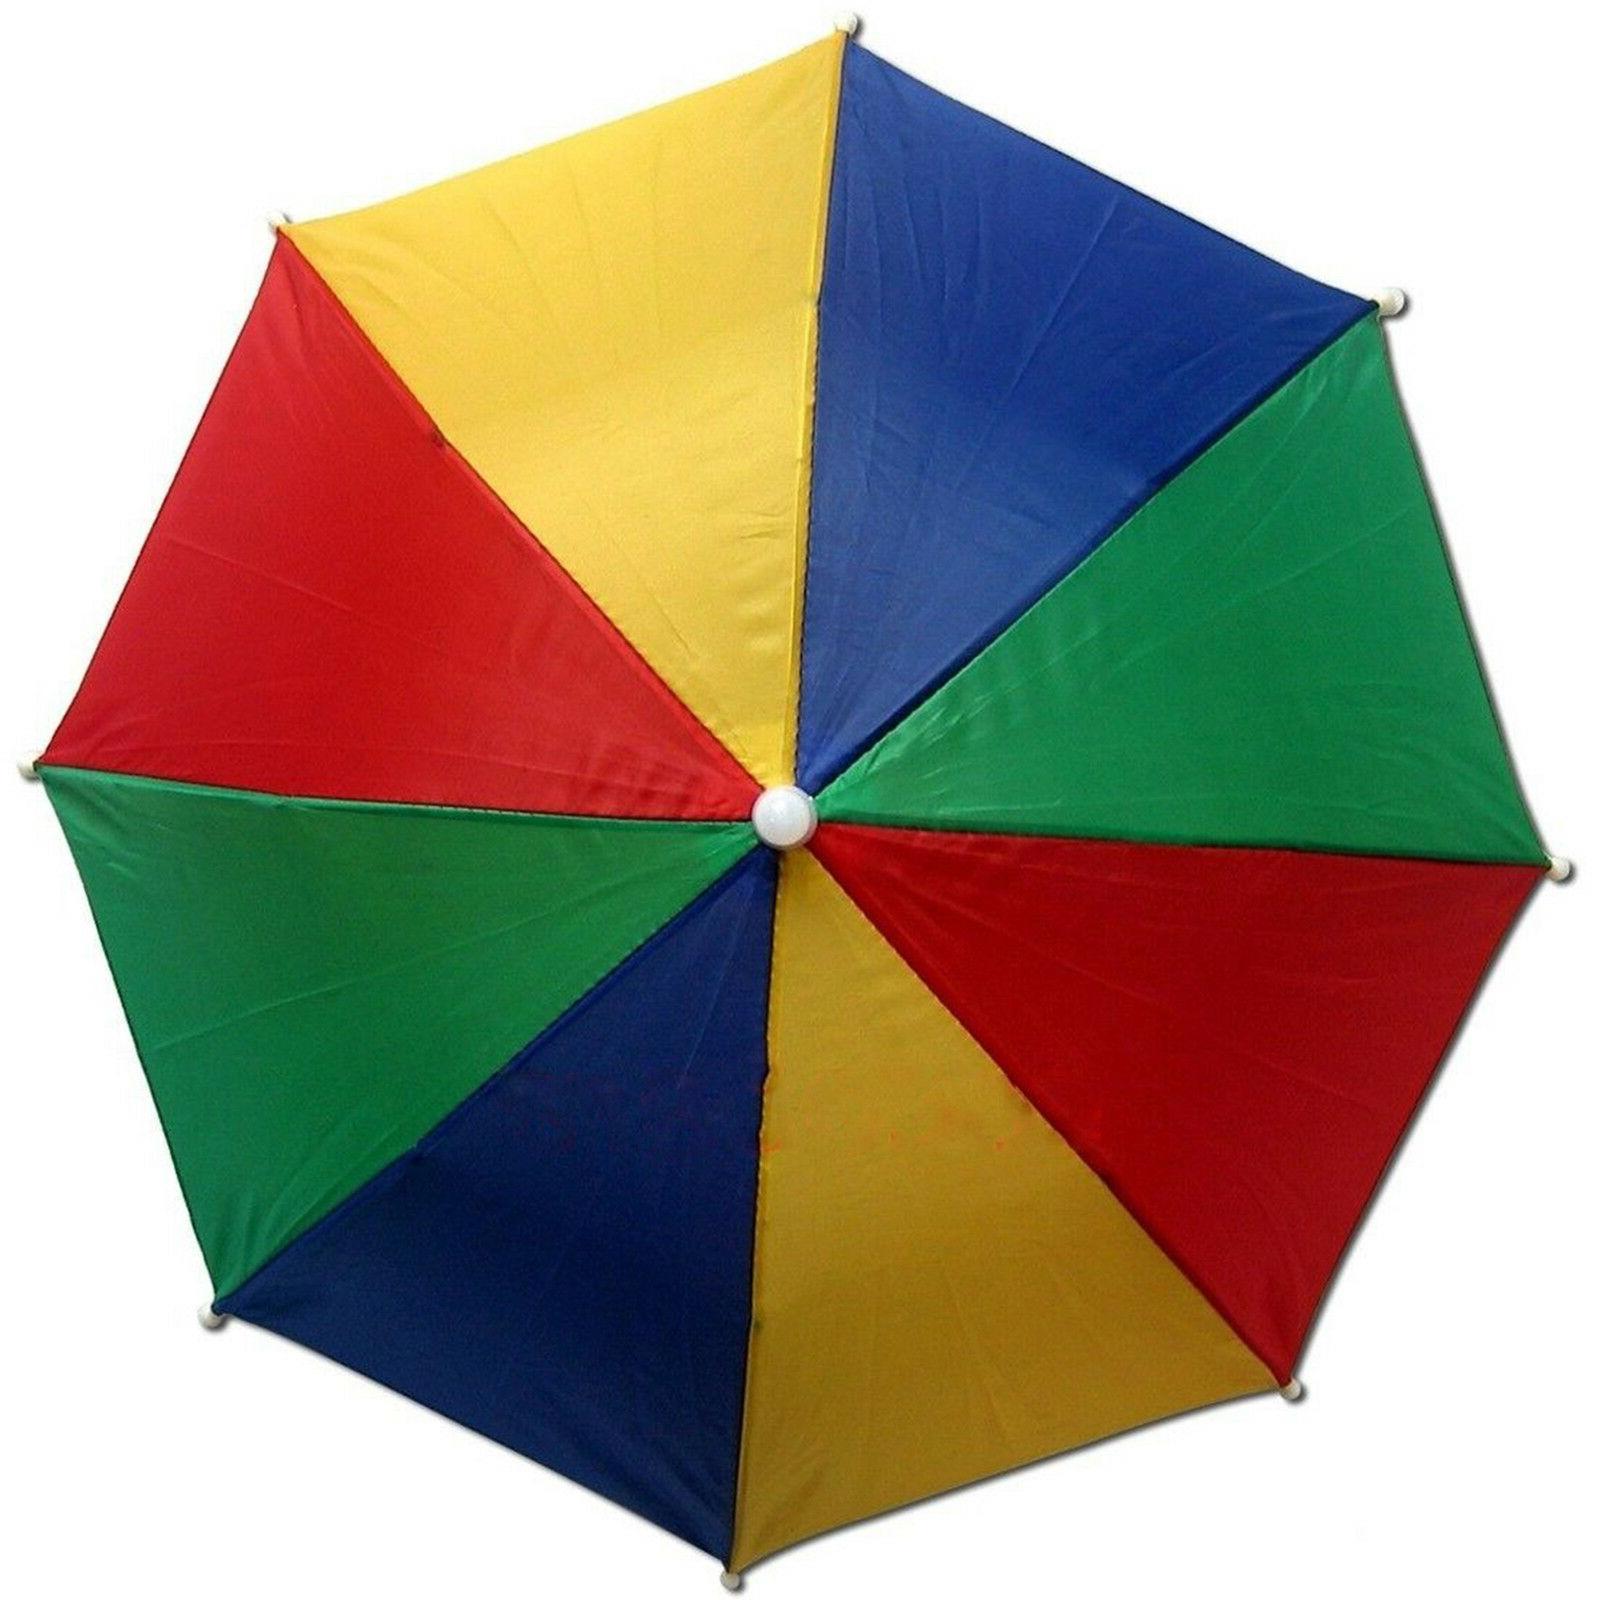 large golf rainbow umbrella strong 16 ribs